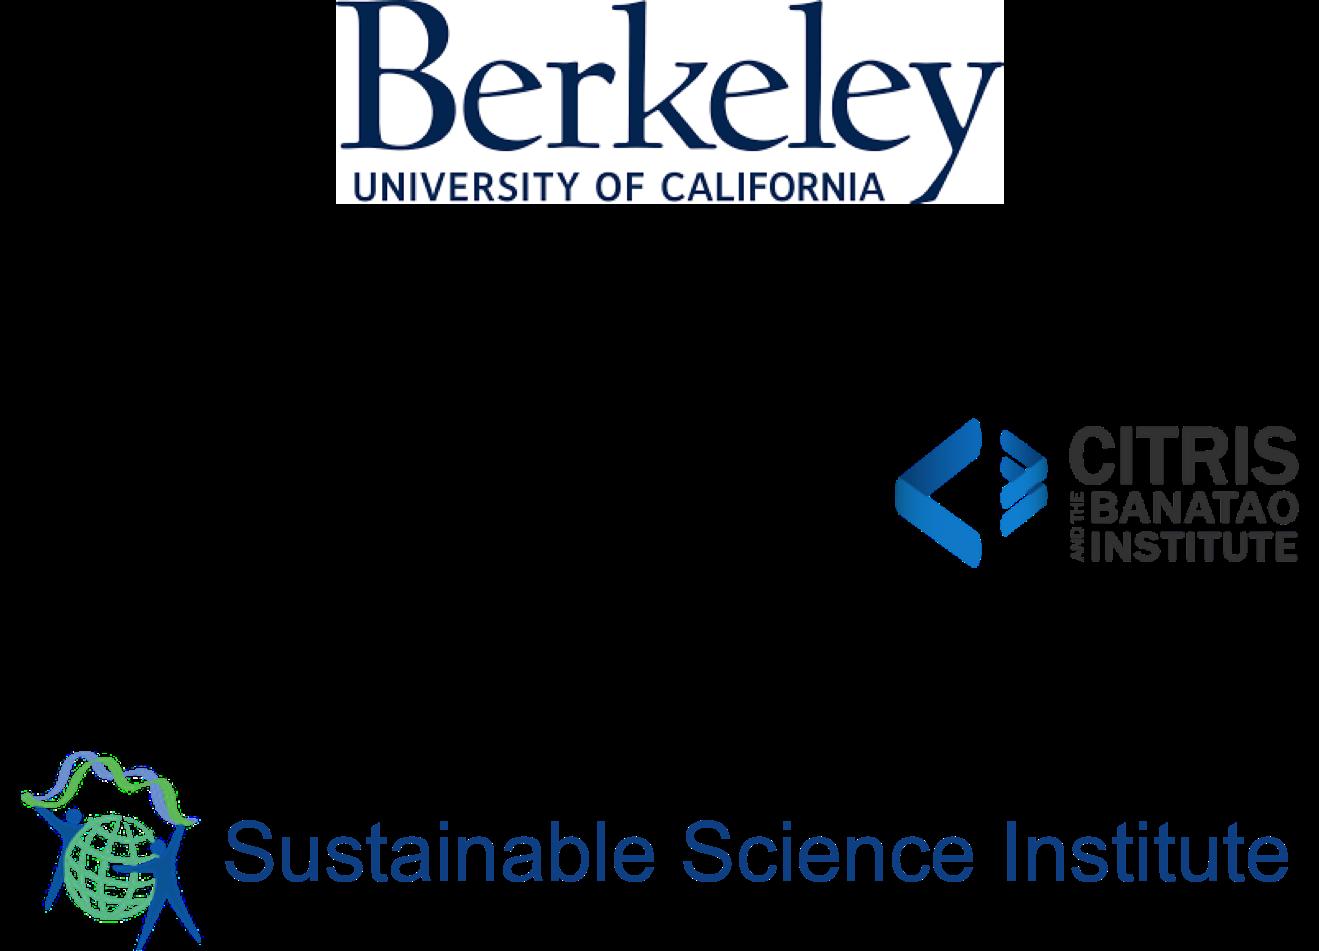 SocialAppsLab-Berkeley-Citris.png